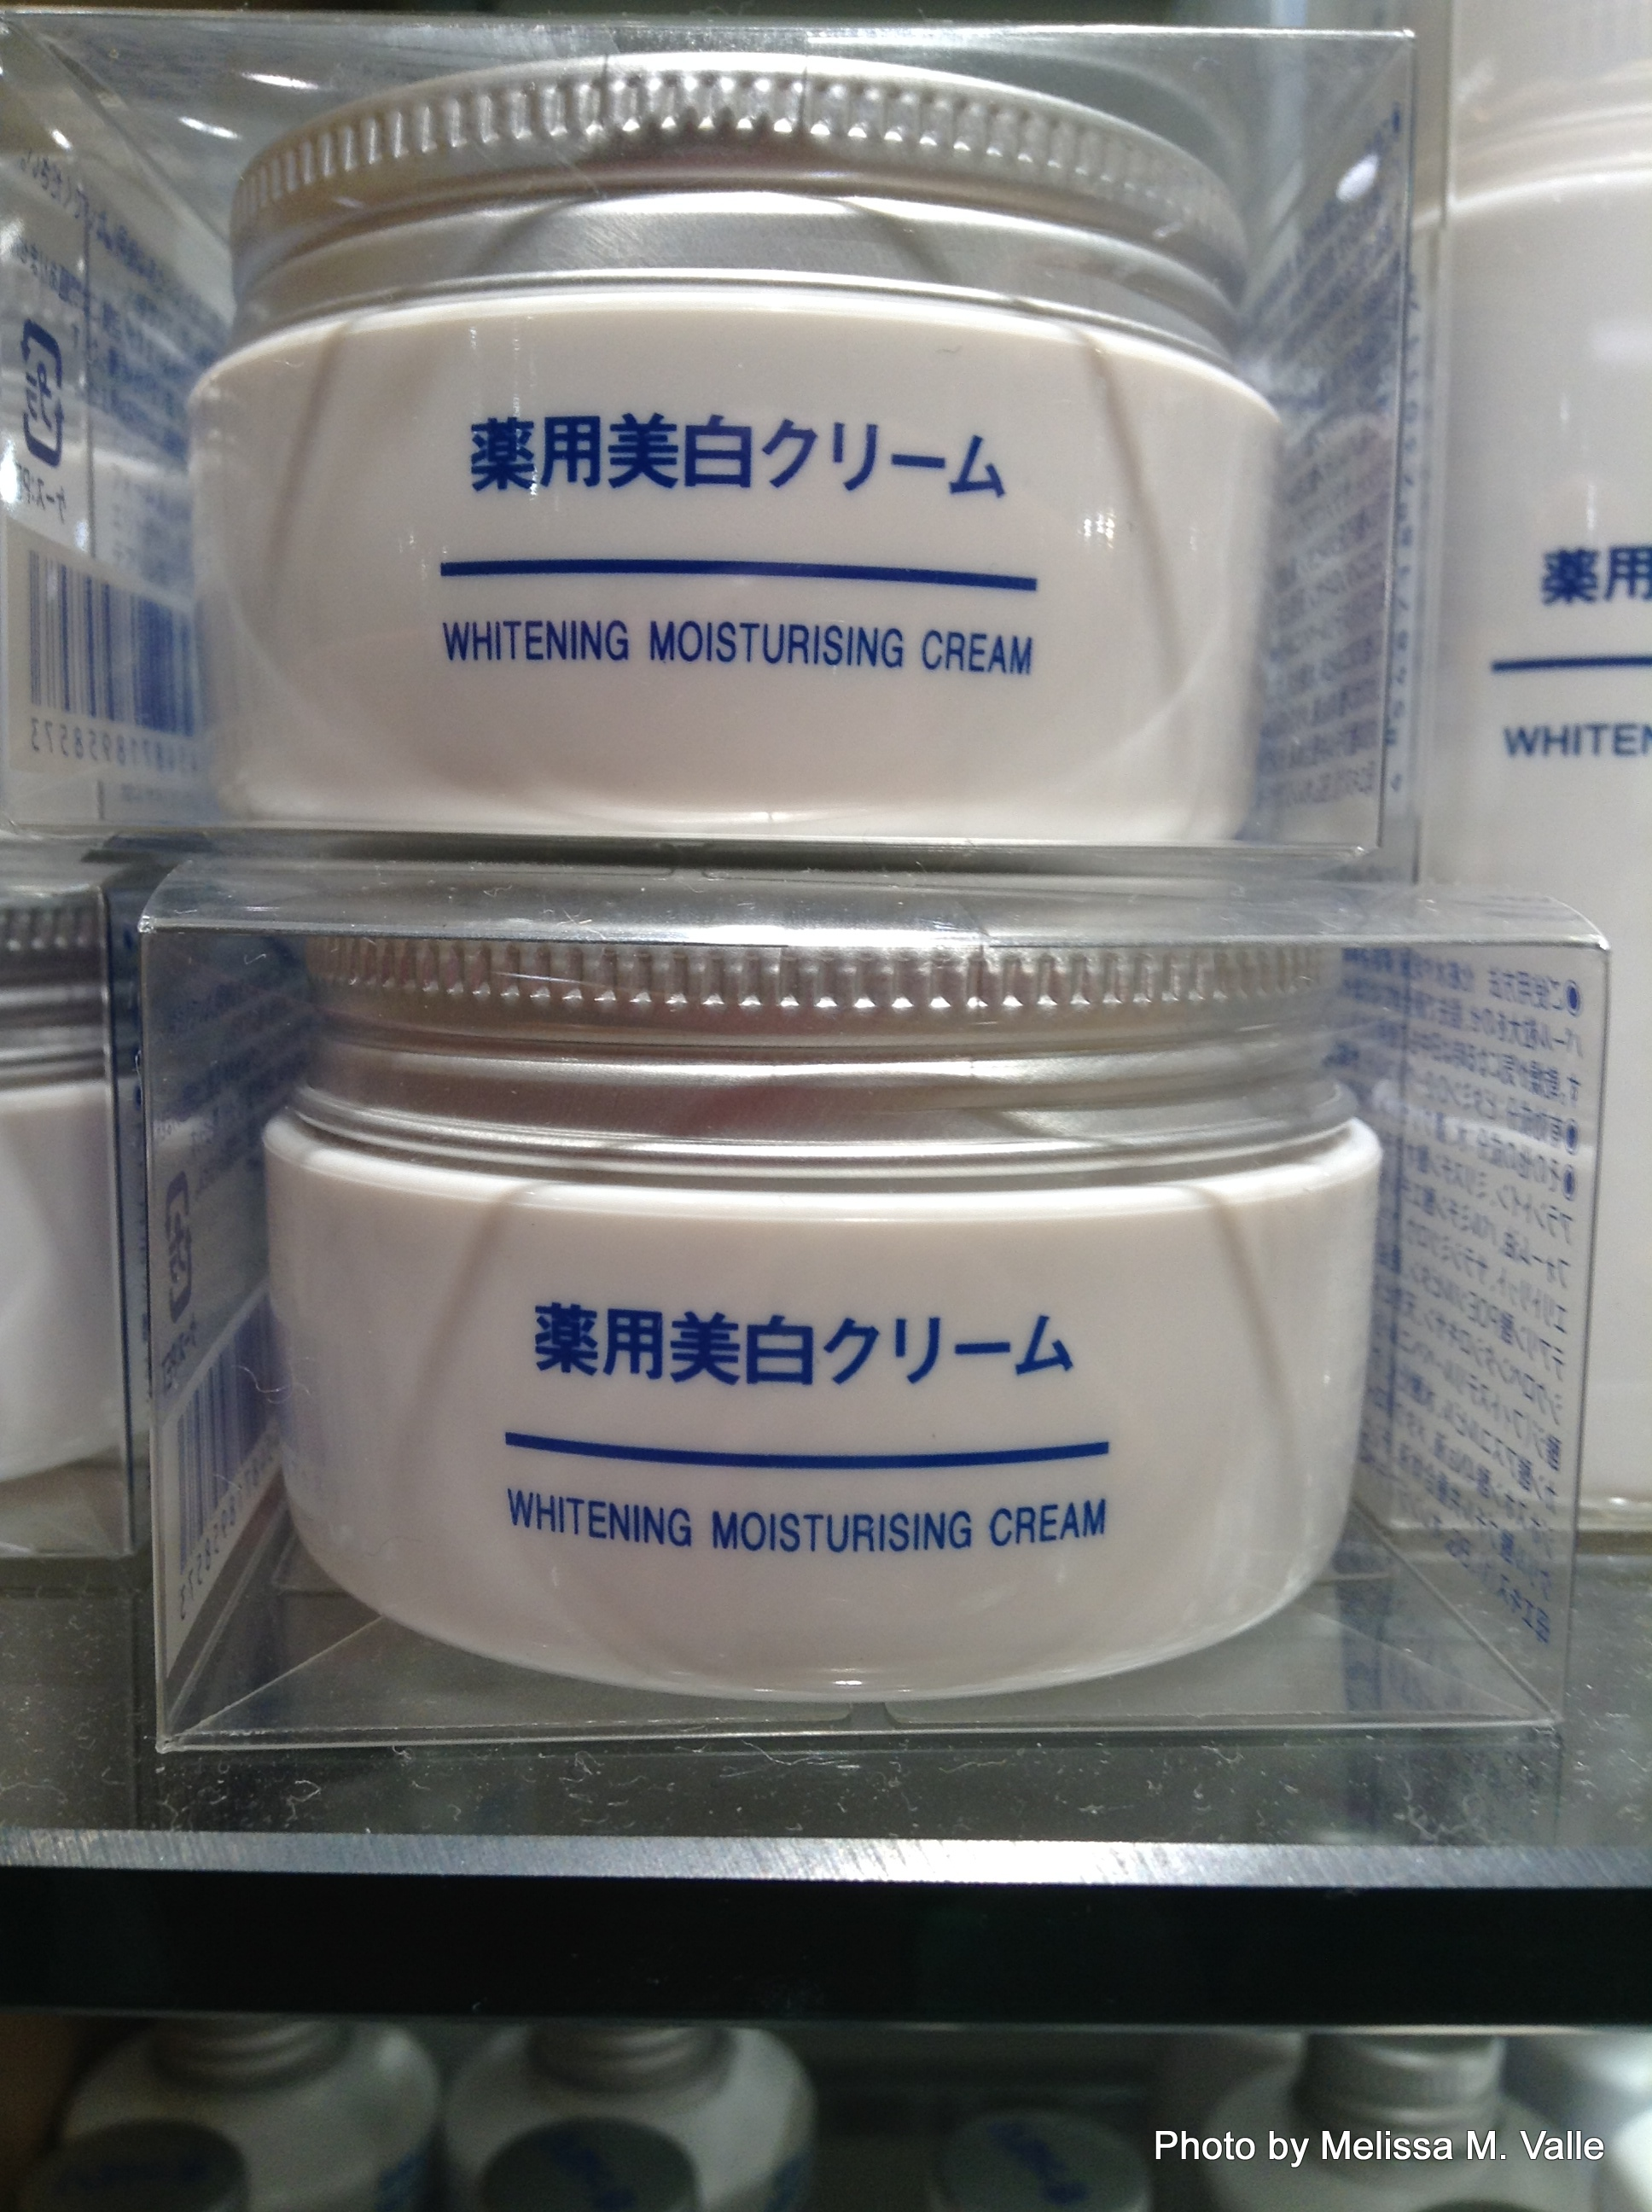 7.21.14 Tokyo, Japan- Ginza, Muji whitening products (1).JPG